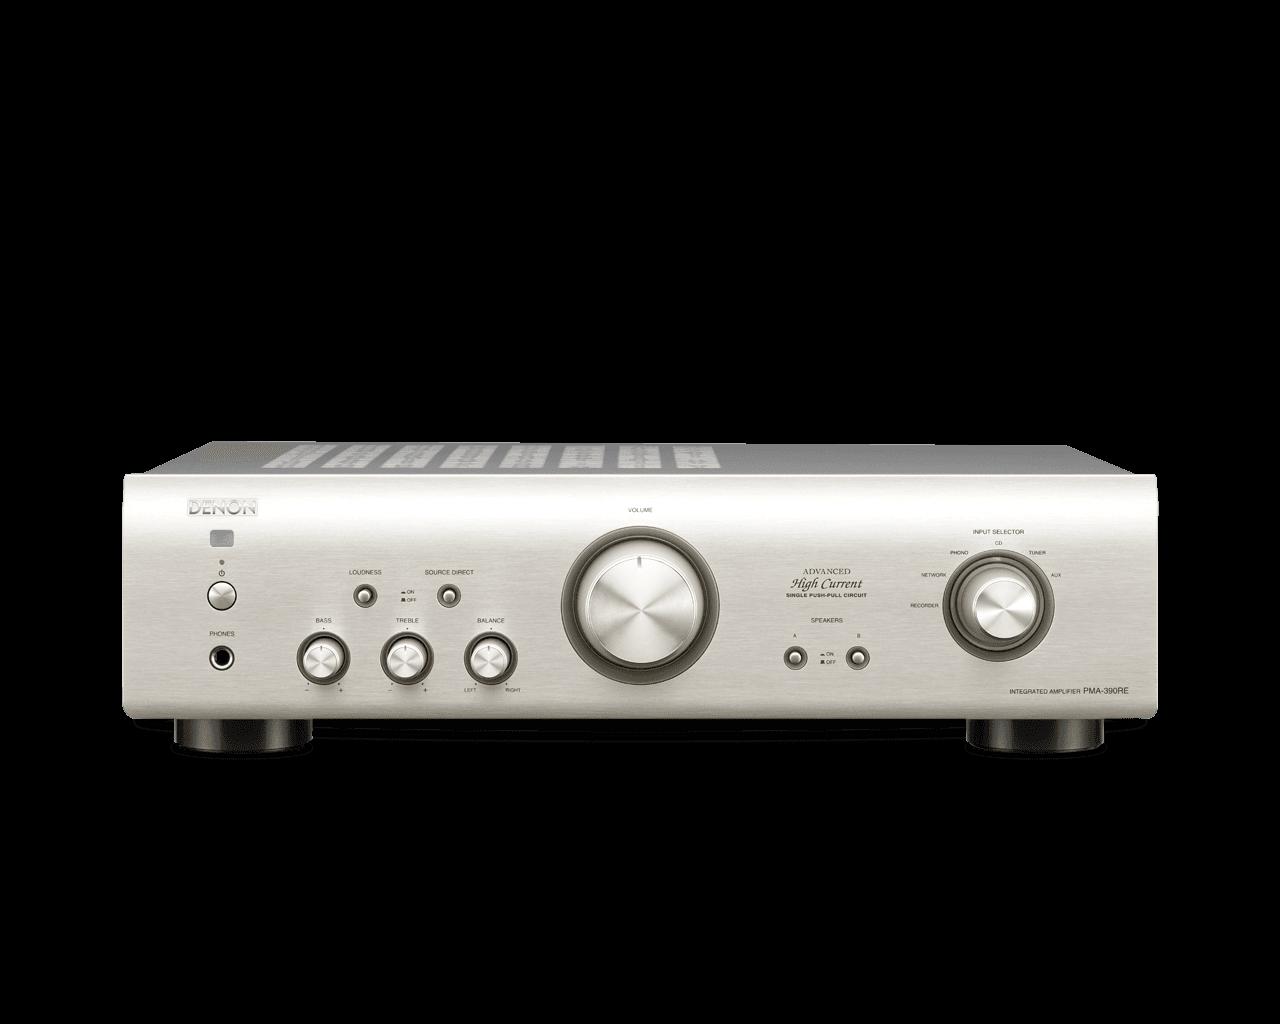 EL PMA390RE jp sp fr New compressor - 10万円でオーディオ始めるならこれ!おすすめのスピーカーとアンプの組み合わせ